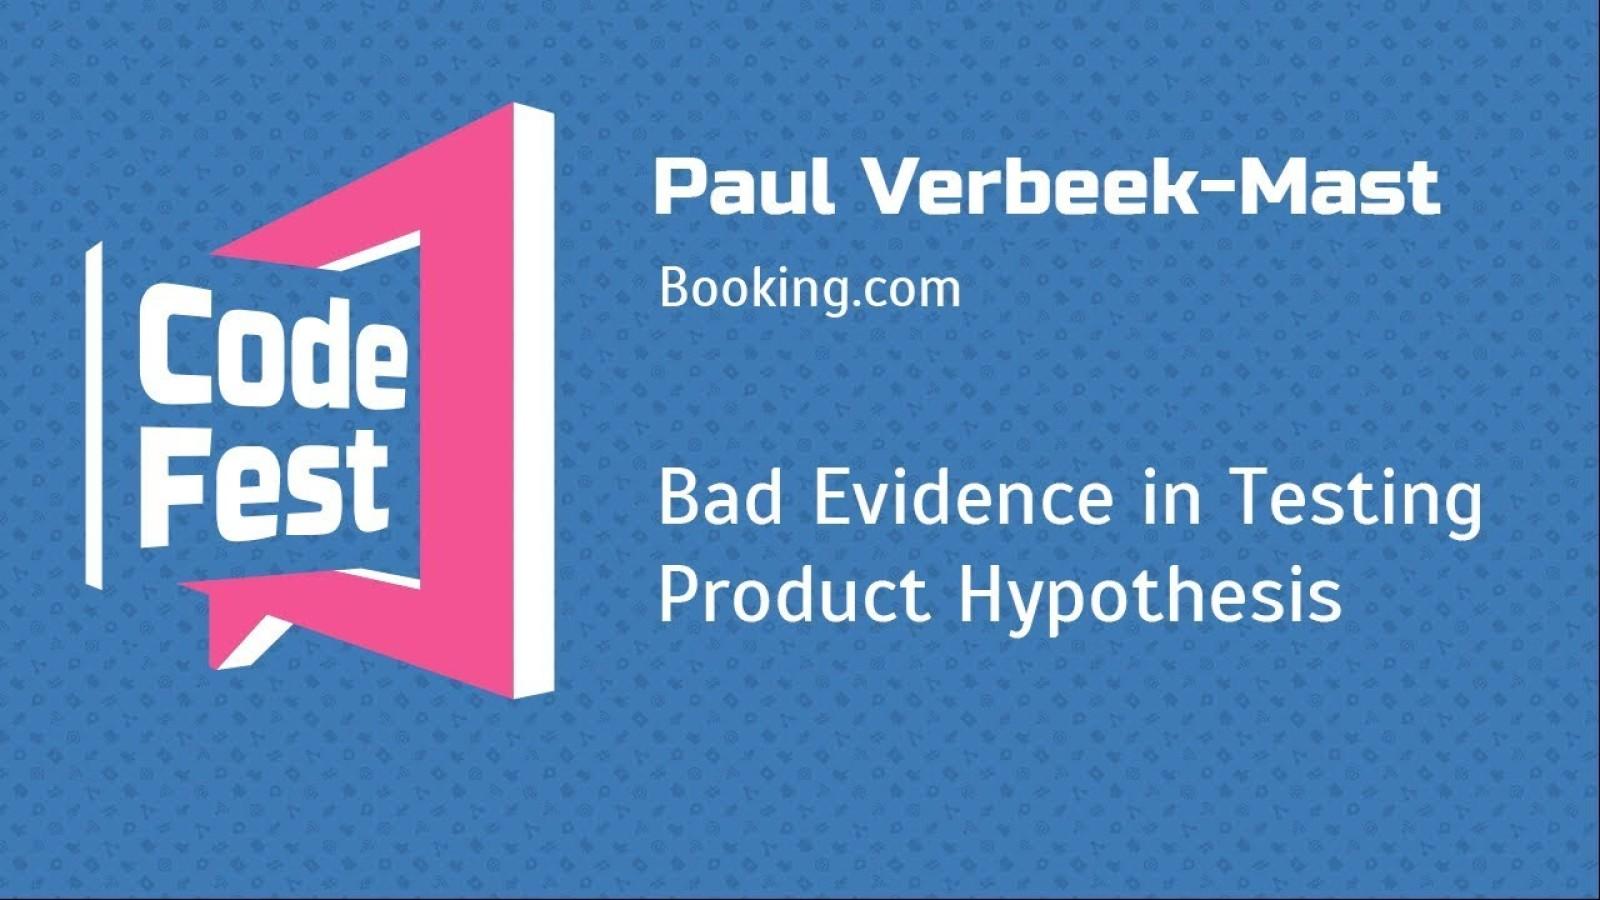 Bad Evidence